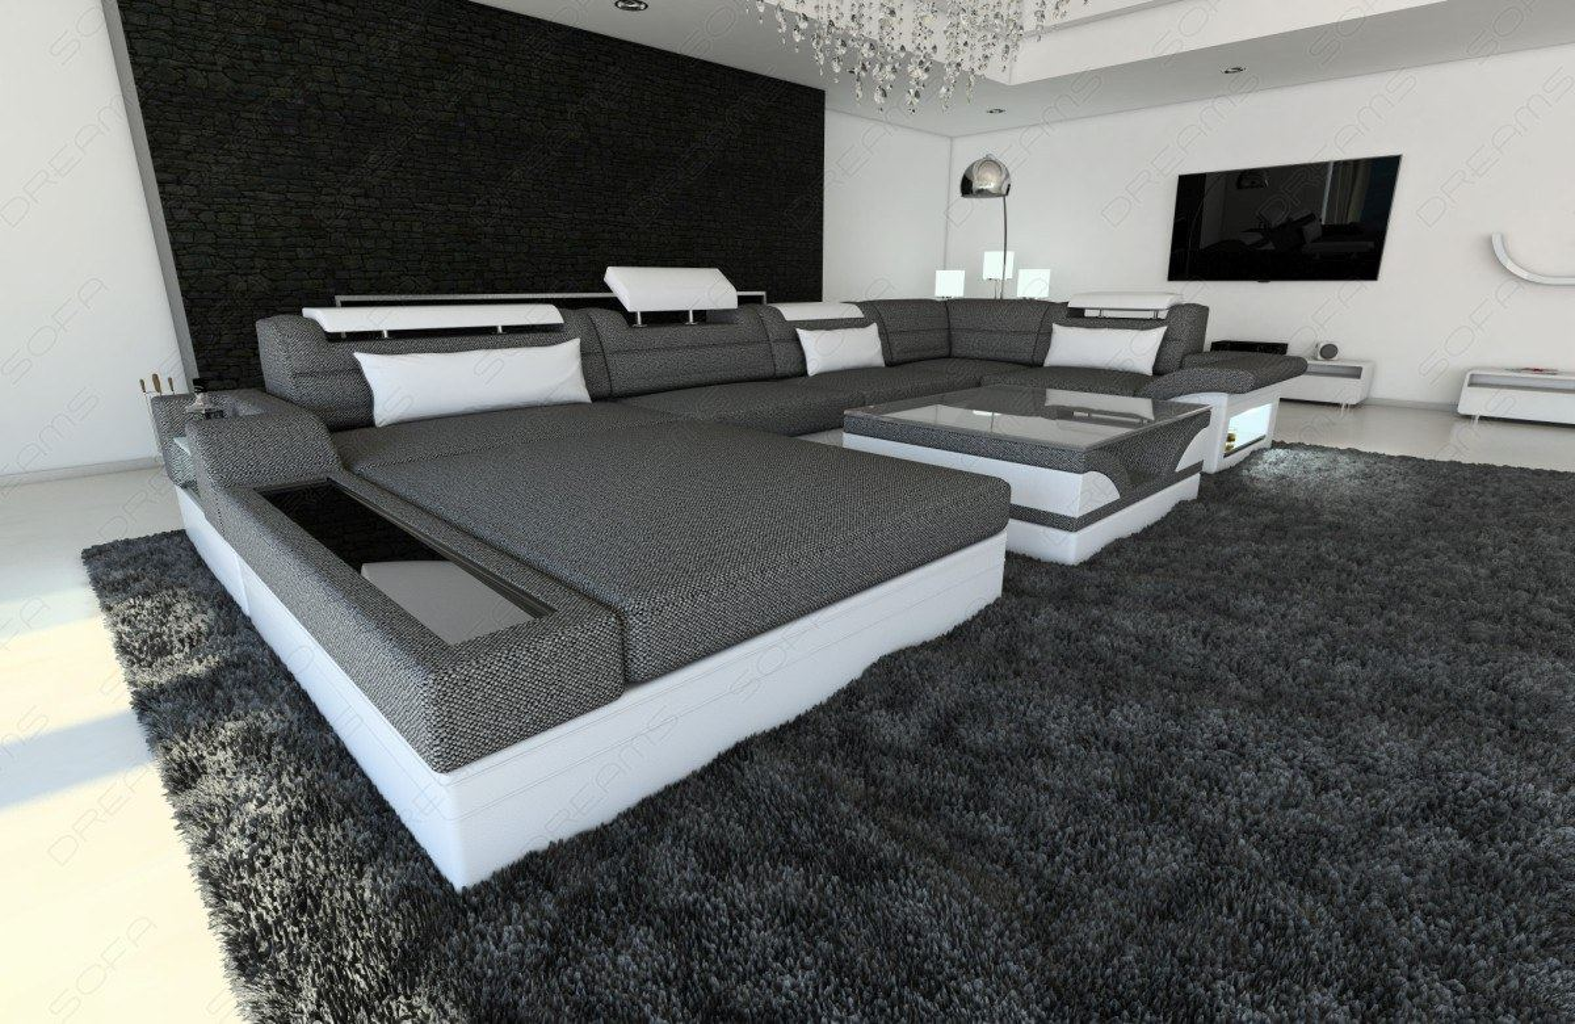 Modern Sectional Fabric Sofa Orlando U Shape with LED Lights | eBay